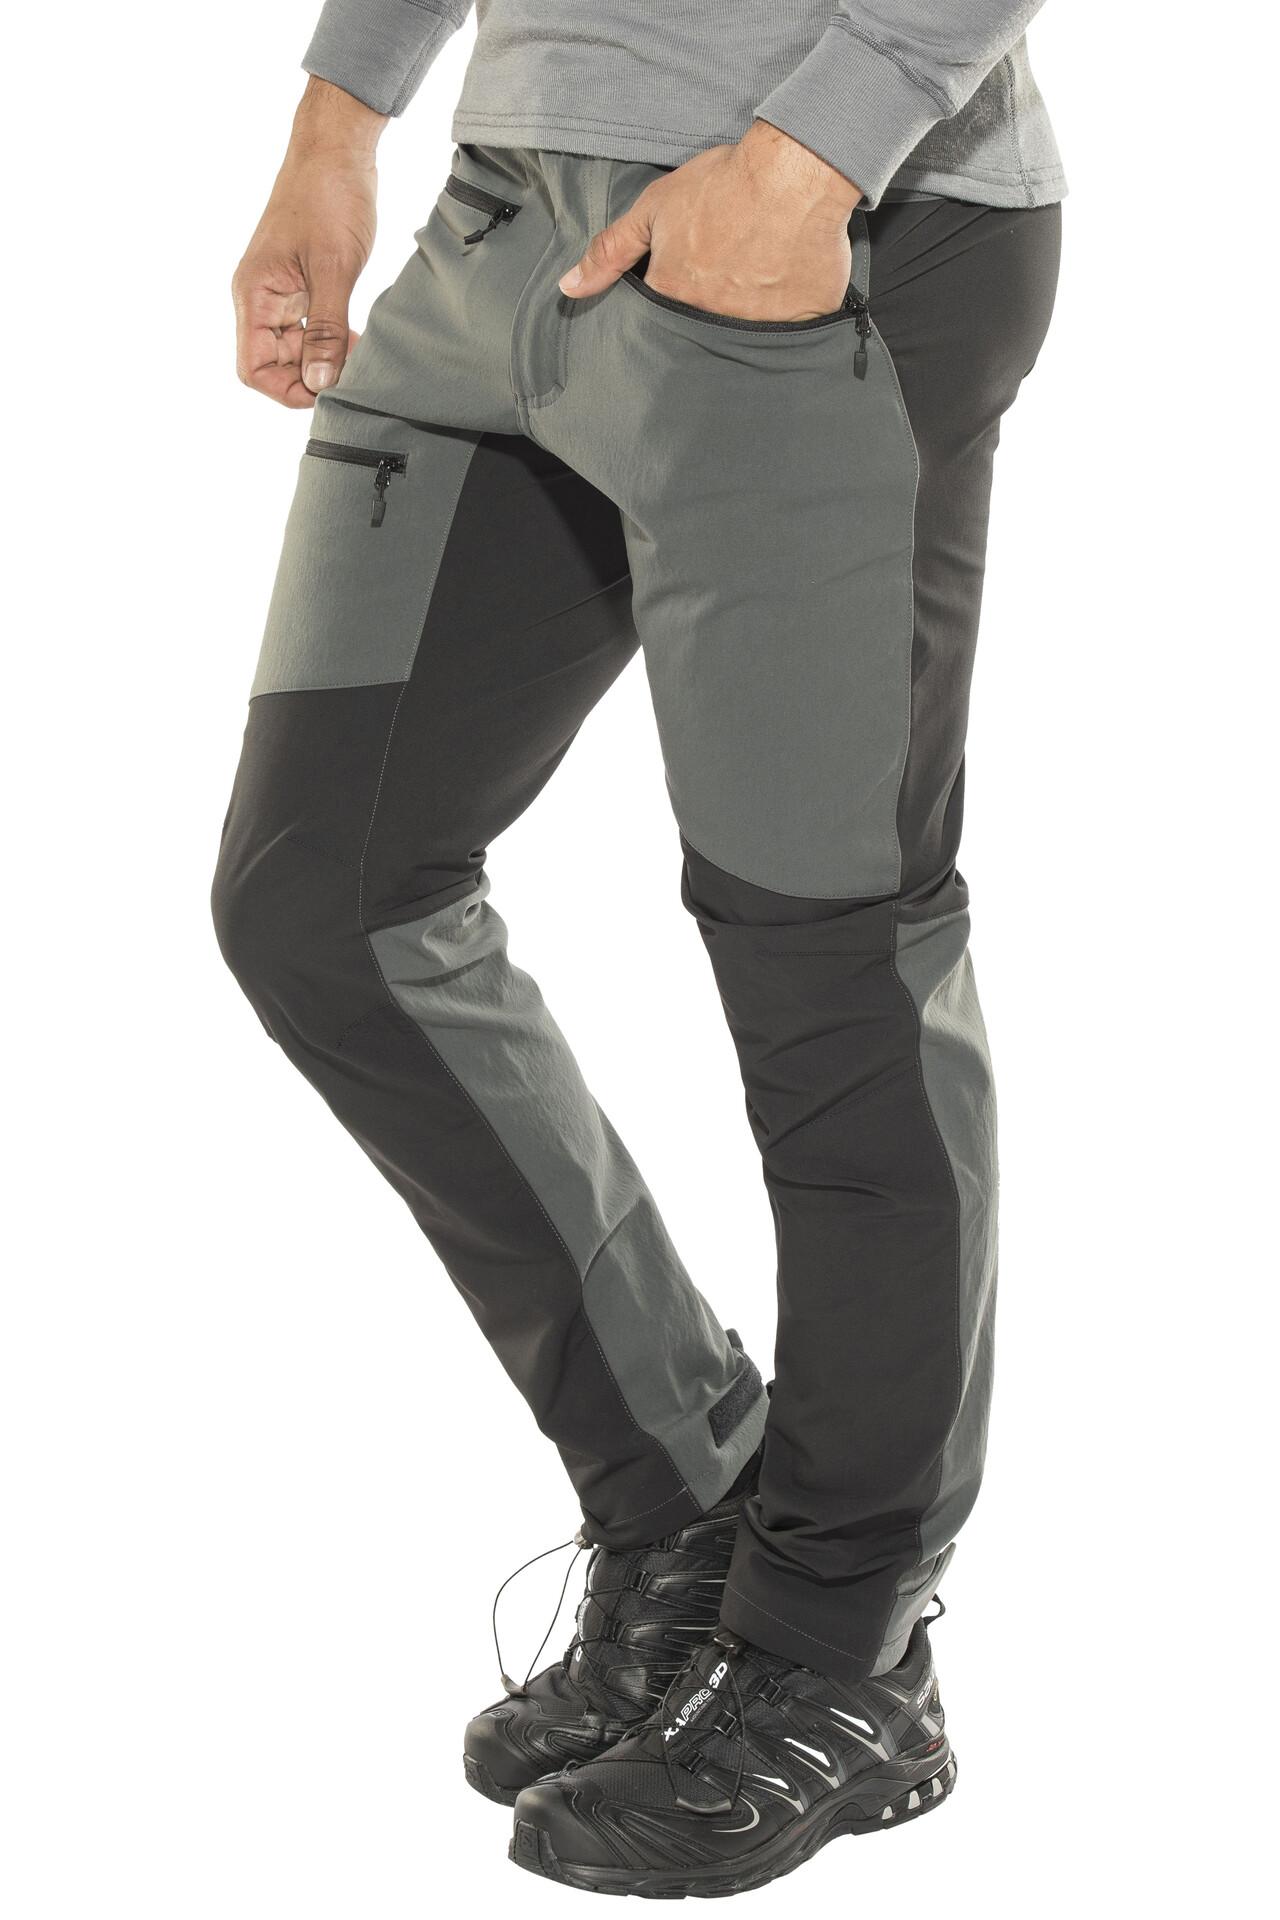 Haglöfs Mid Flex Pant Short  Kurzgröße  Trekking Herrenhose  schwarz